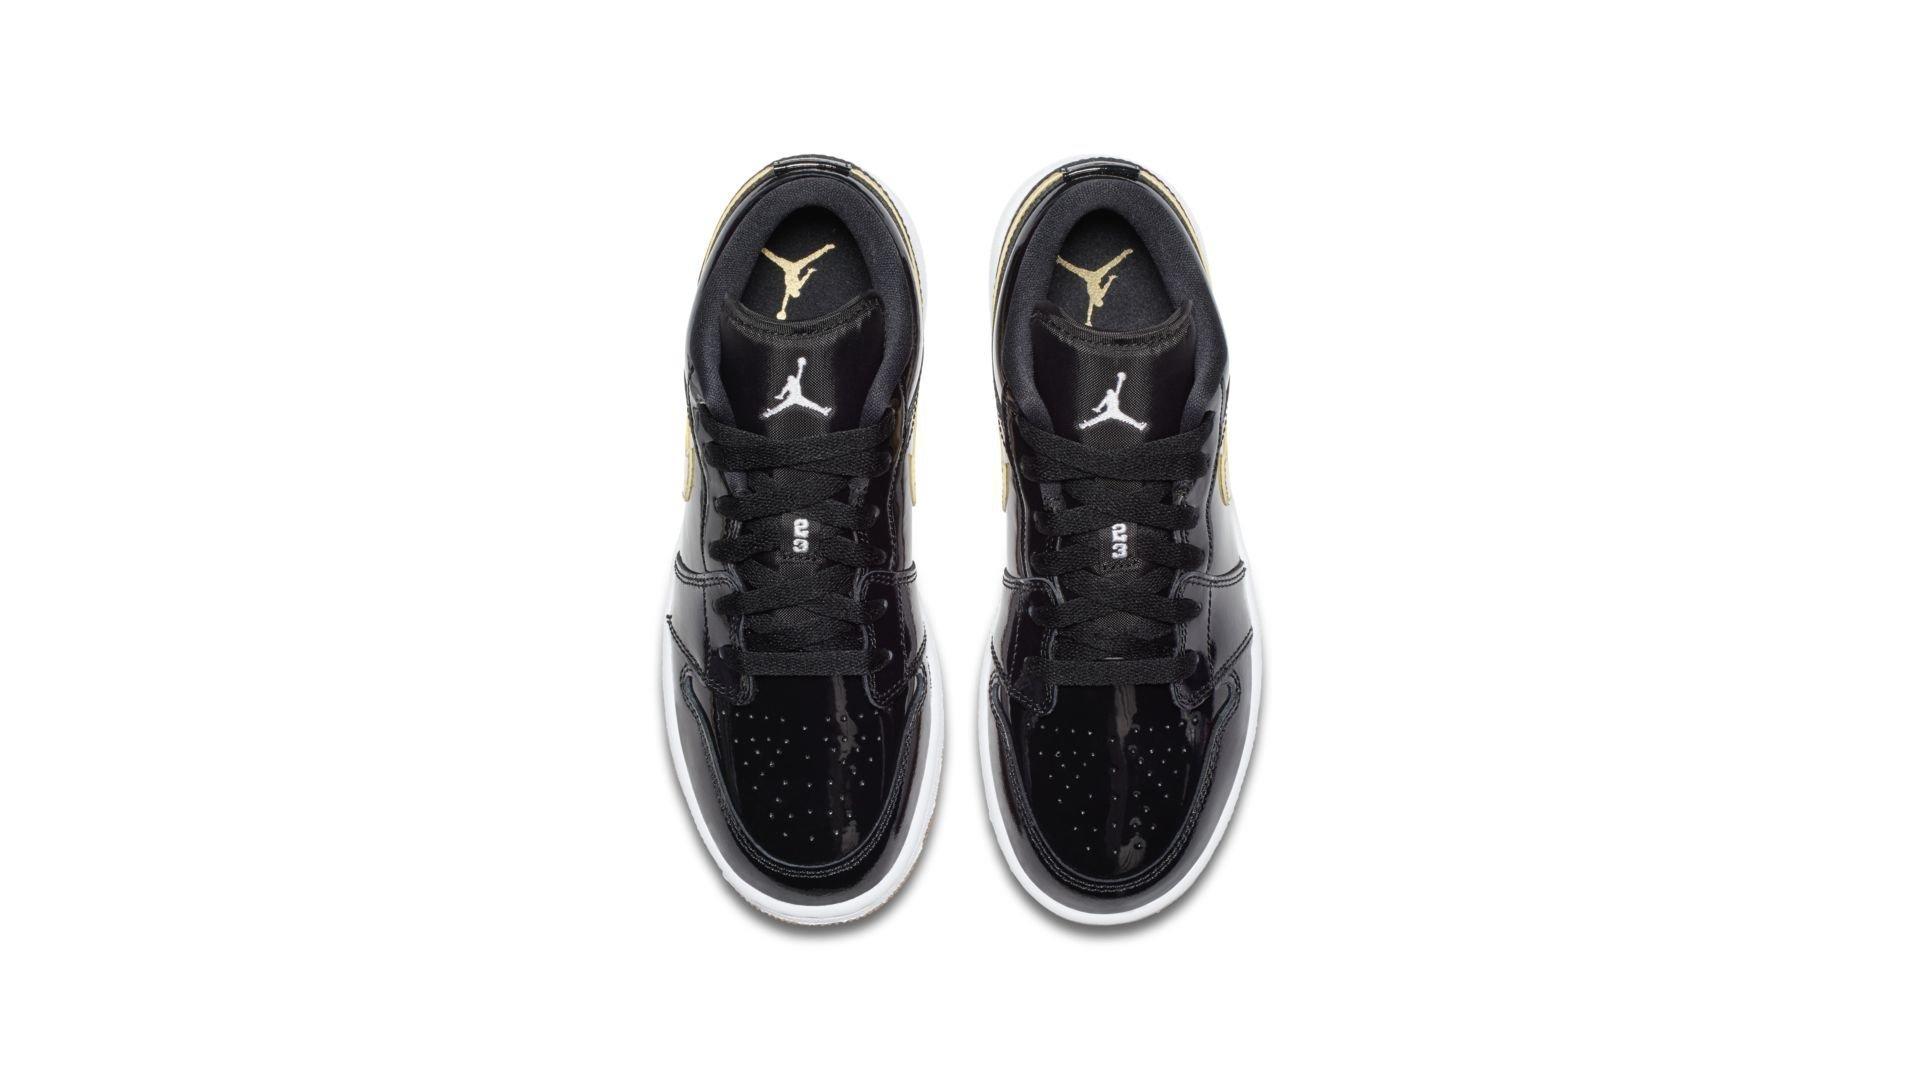 Jordan 1 Retro Low Black Gold Patent (GS) (554723-032)